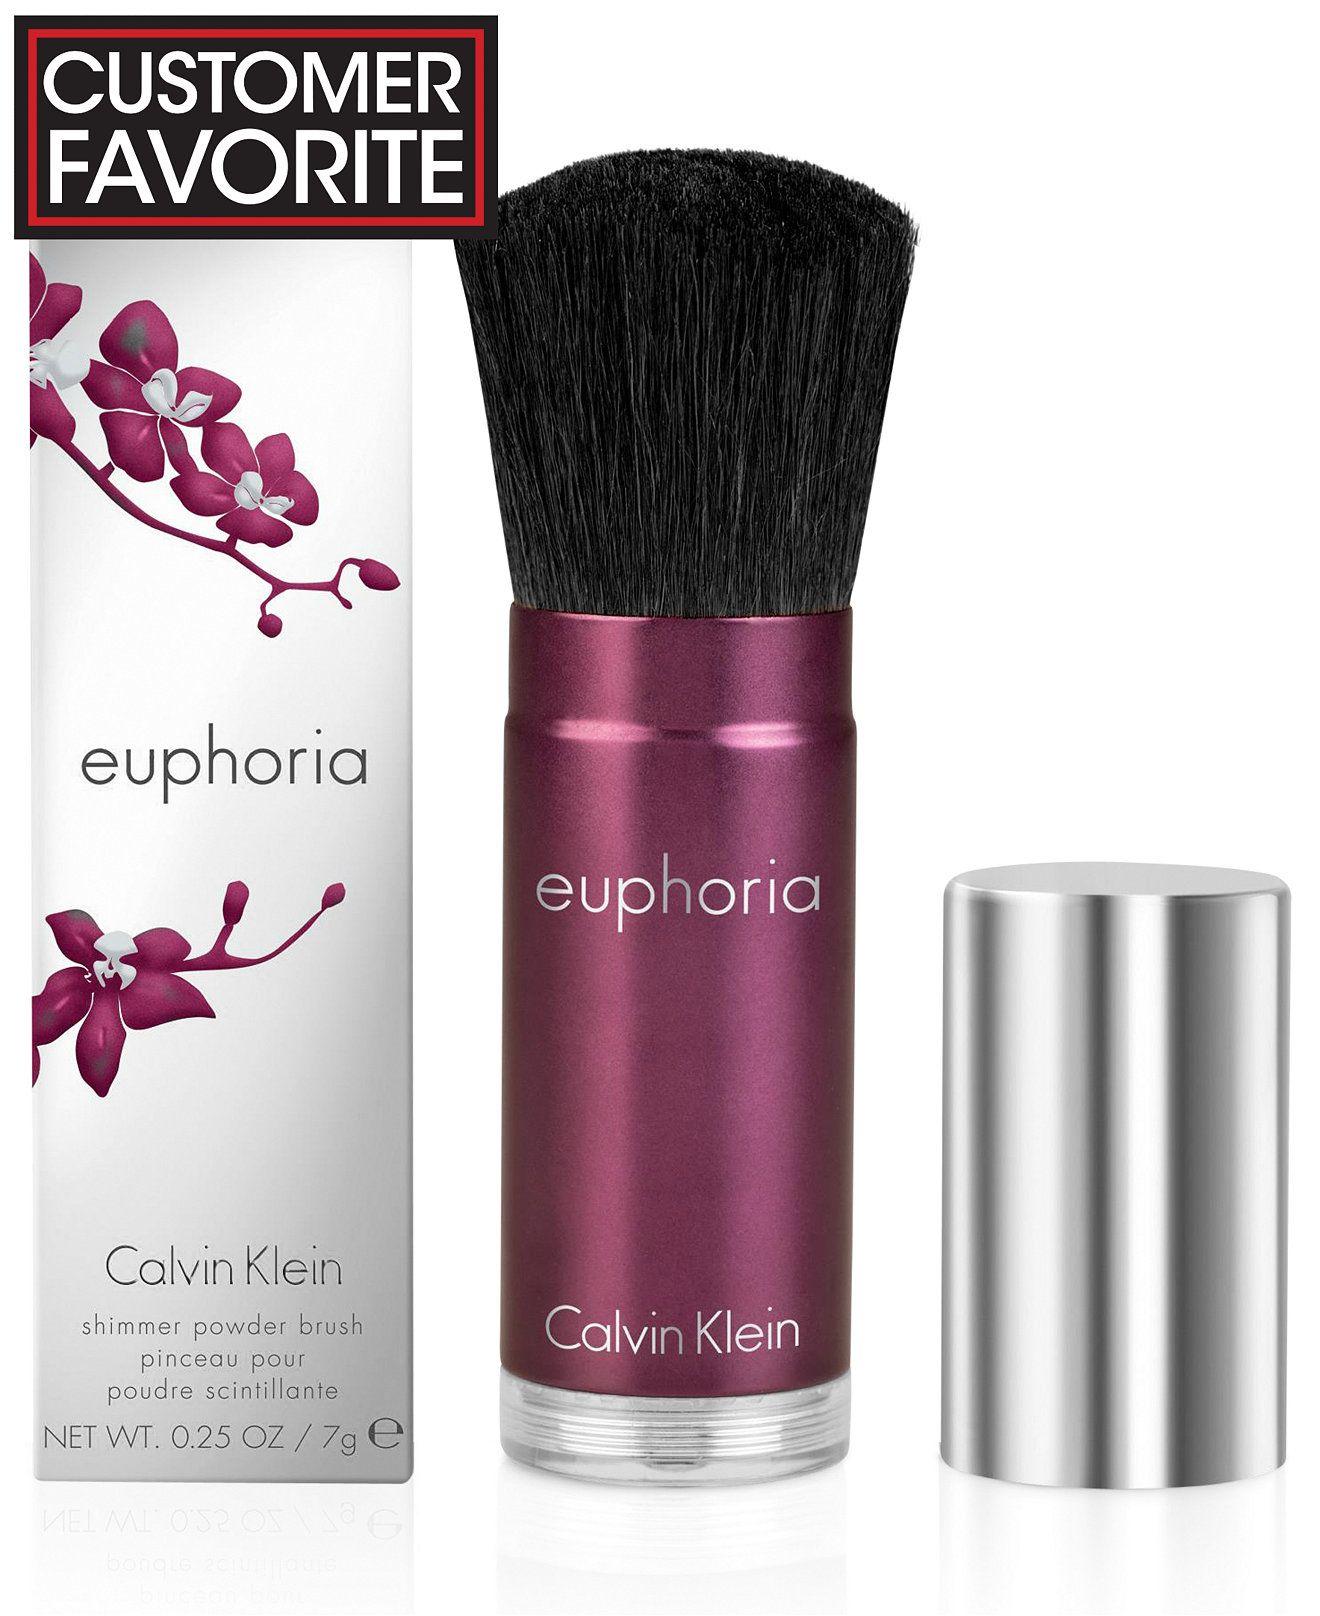 5979695402 Calvin Klein euphoria Shimmer Powder Brush - Perfume - Beauty - Macy s